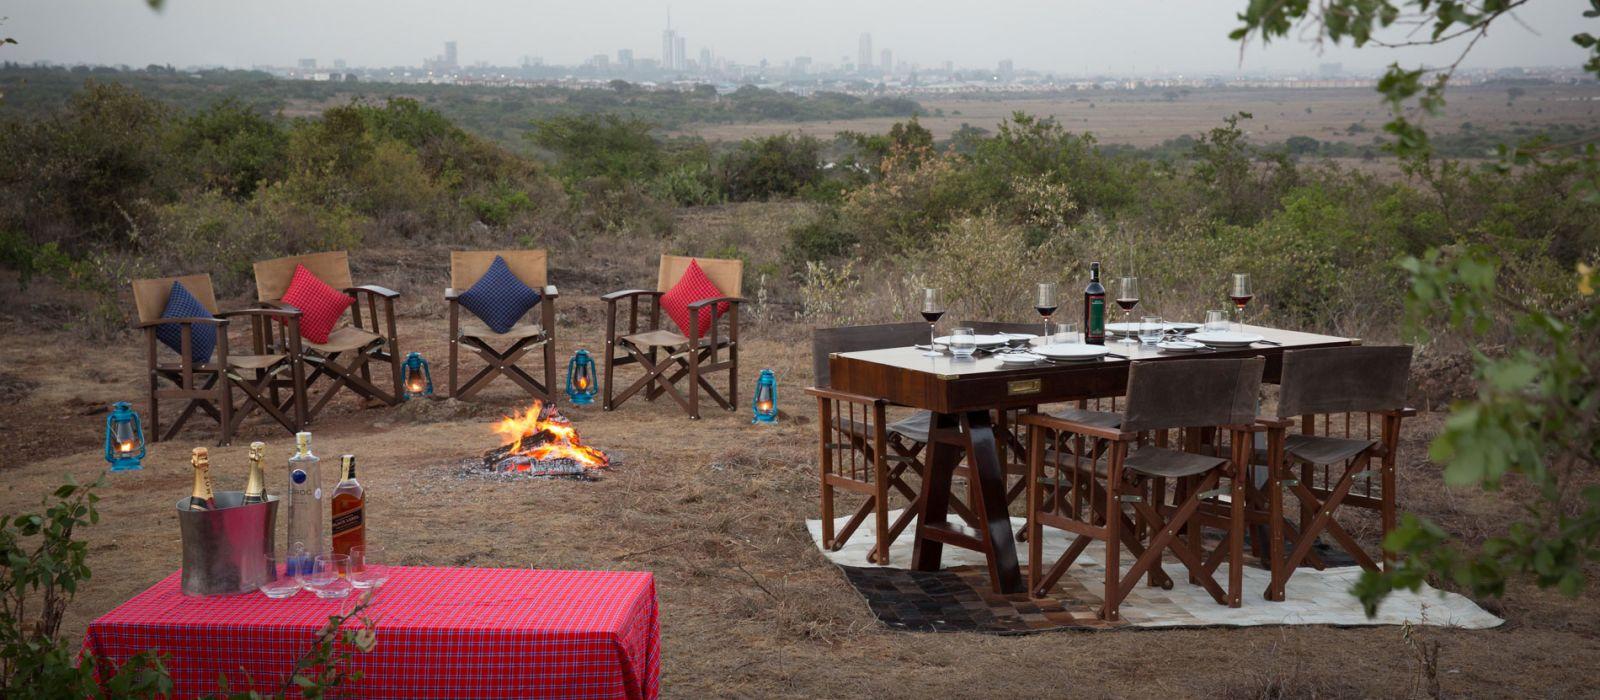 Hoch über Kenia: Safari & Strand Urlaub 2